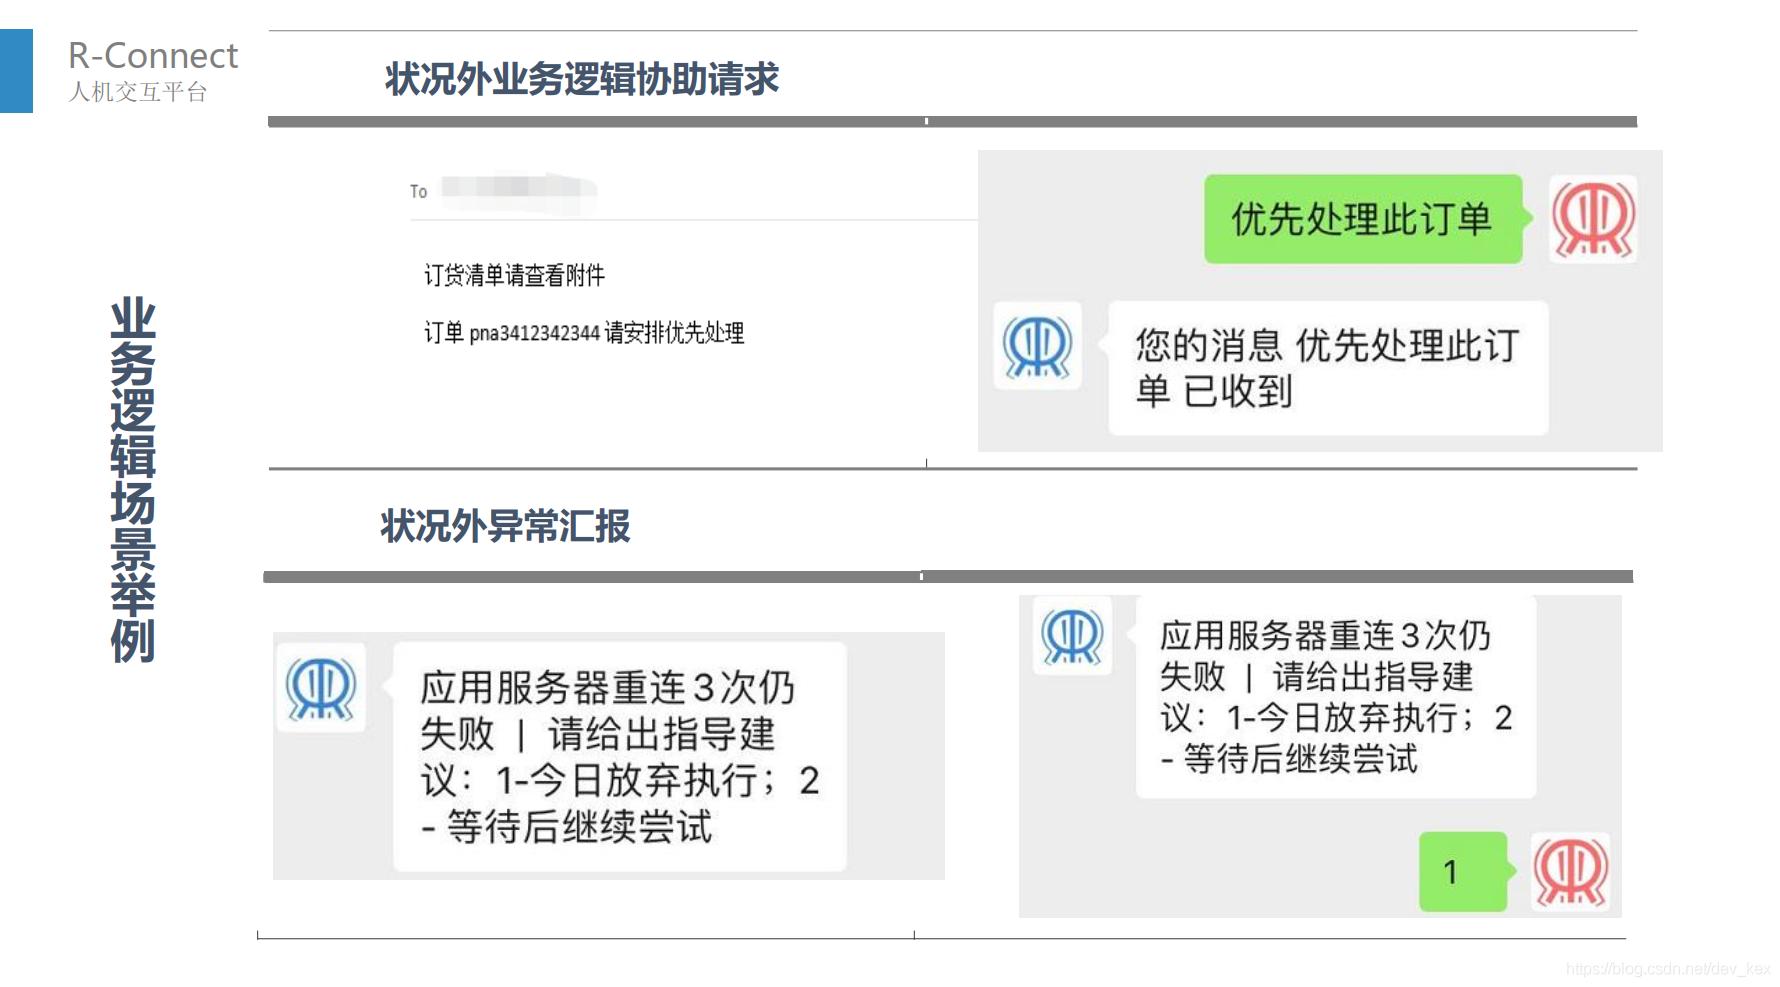 RPA开发利器,R-Connect 人机交互解决方案插图(1)